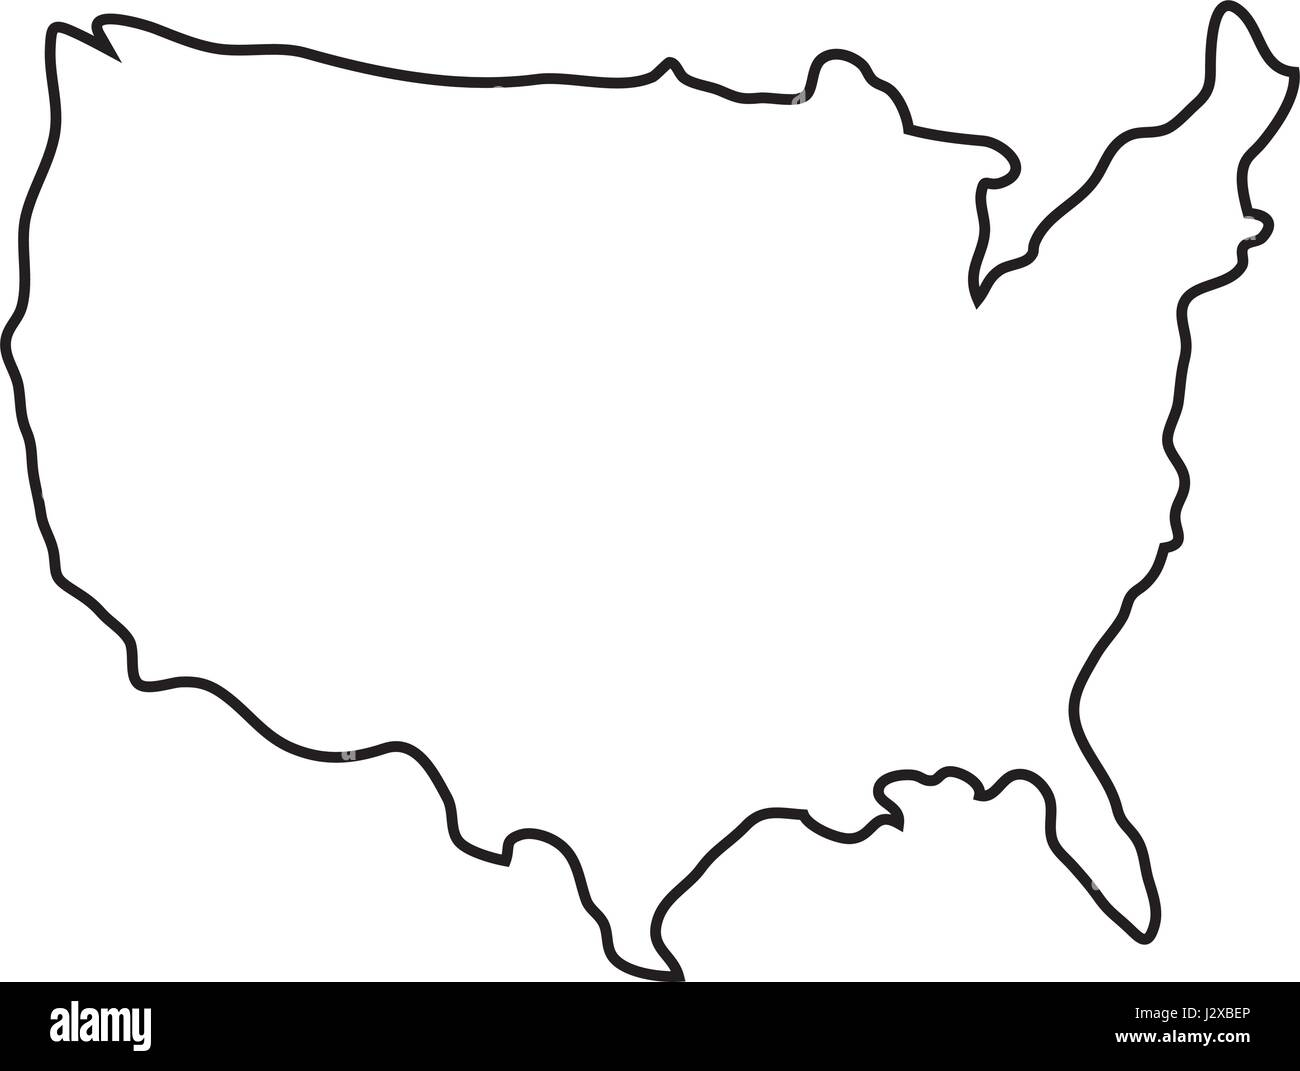 Usa Country Map Icon Stock Vector Art Illustration Vector Image - Usa country map